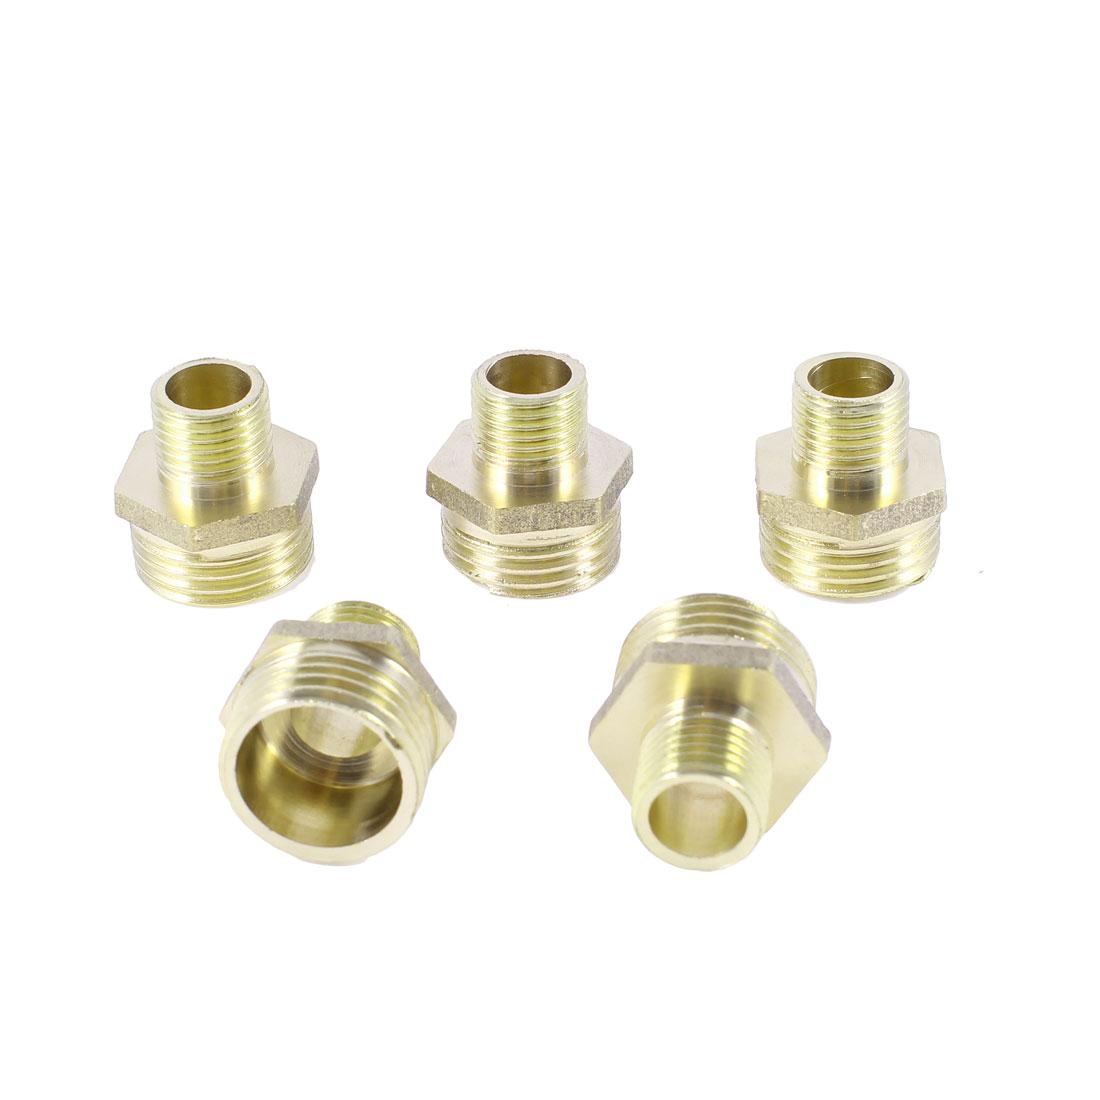 "5PCS 1/4""PT x 1/2""PT M/M Thread Pneumatic Air Hose Quick Joint Hex Nipple"